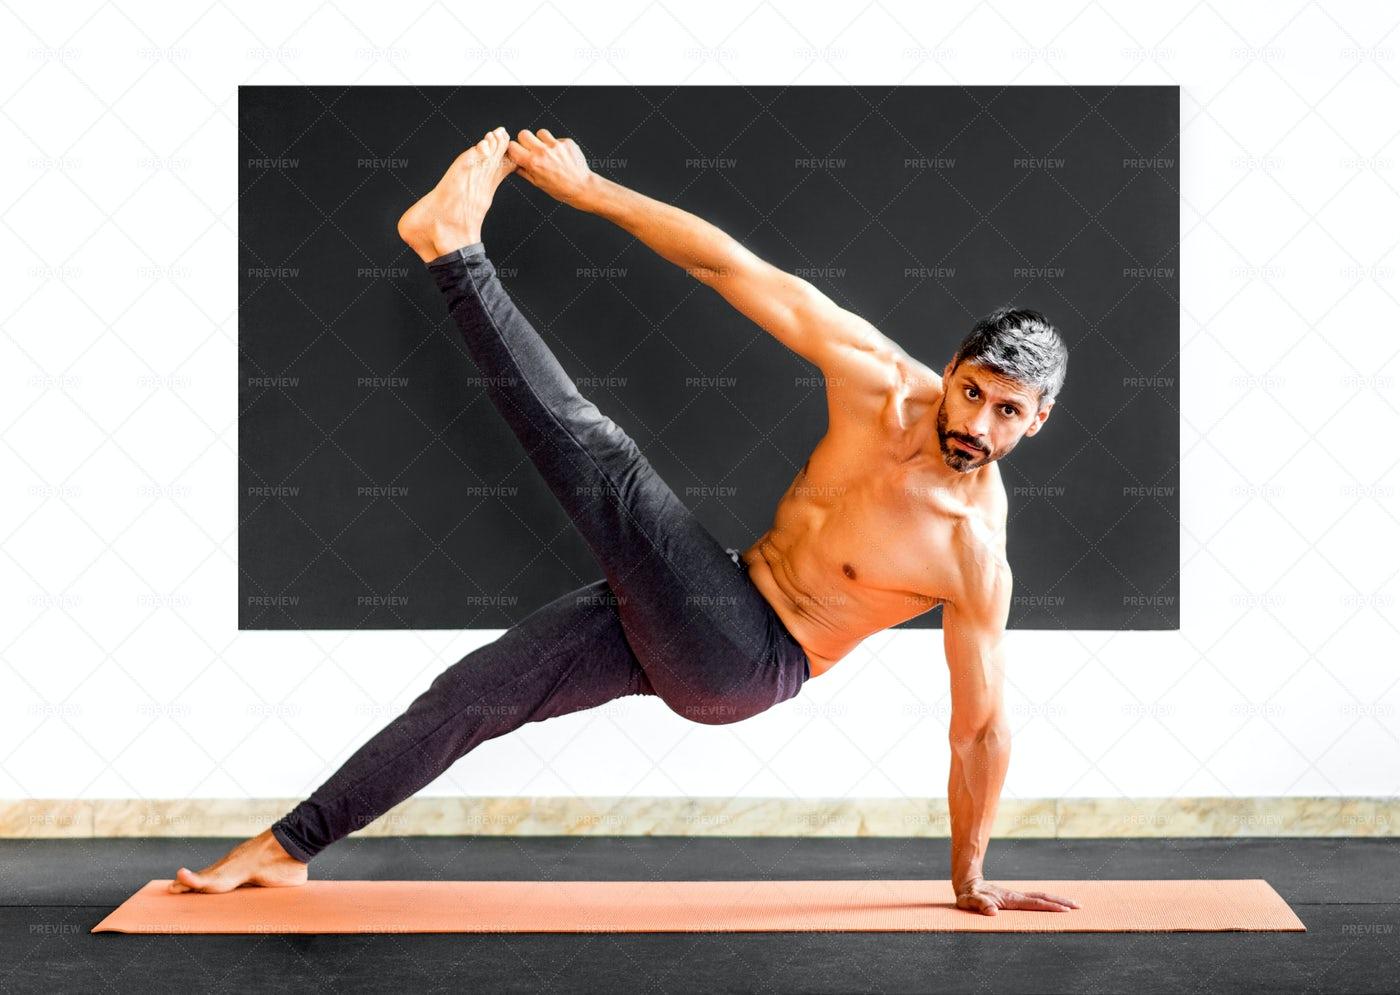 Man Doing Stretch Exercises: Stock Photos